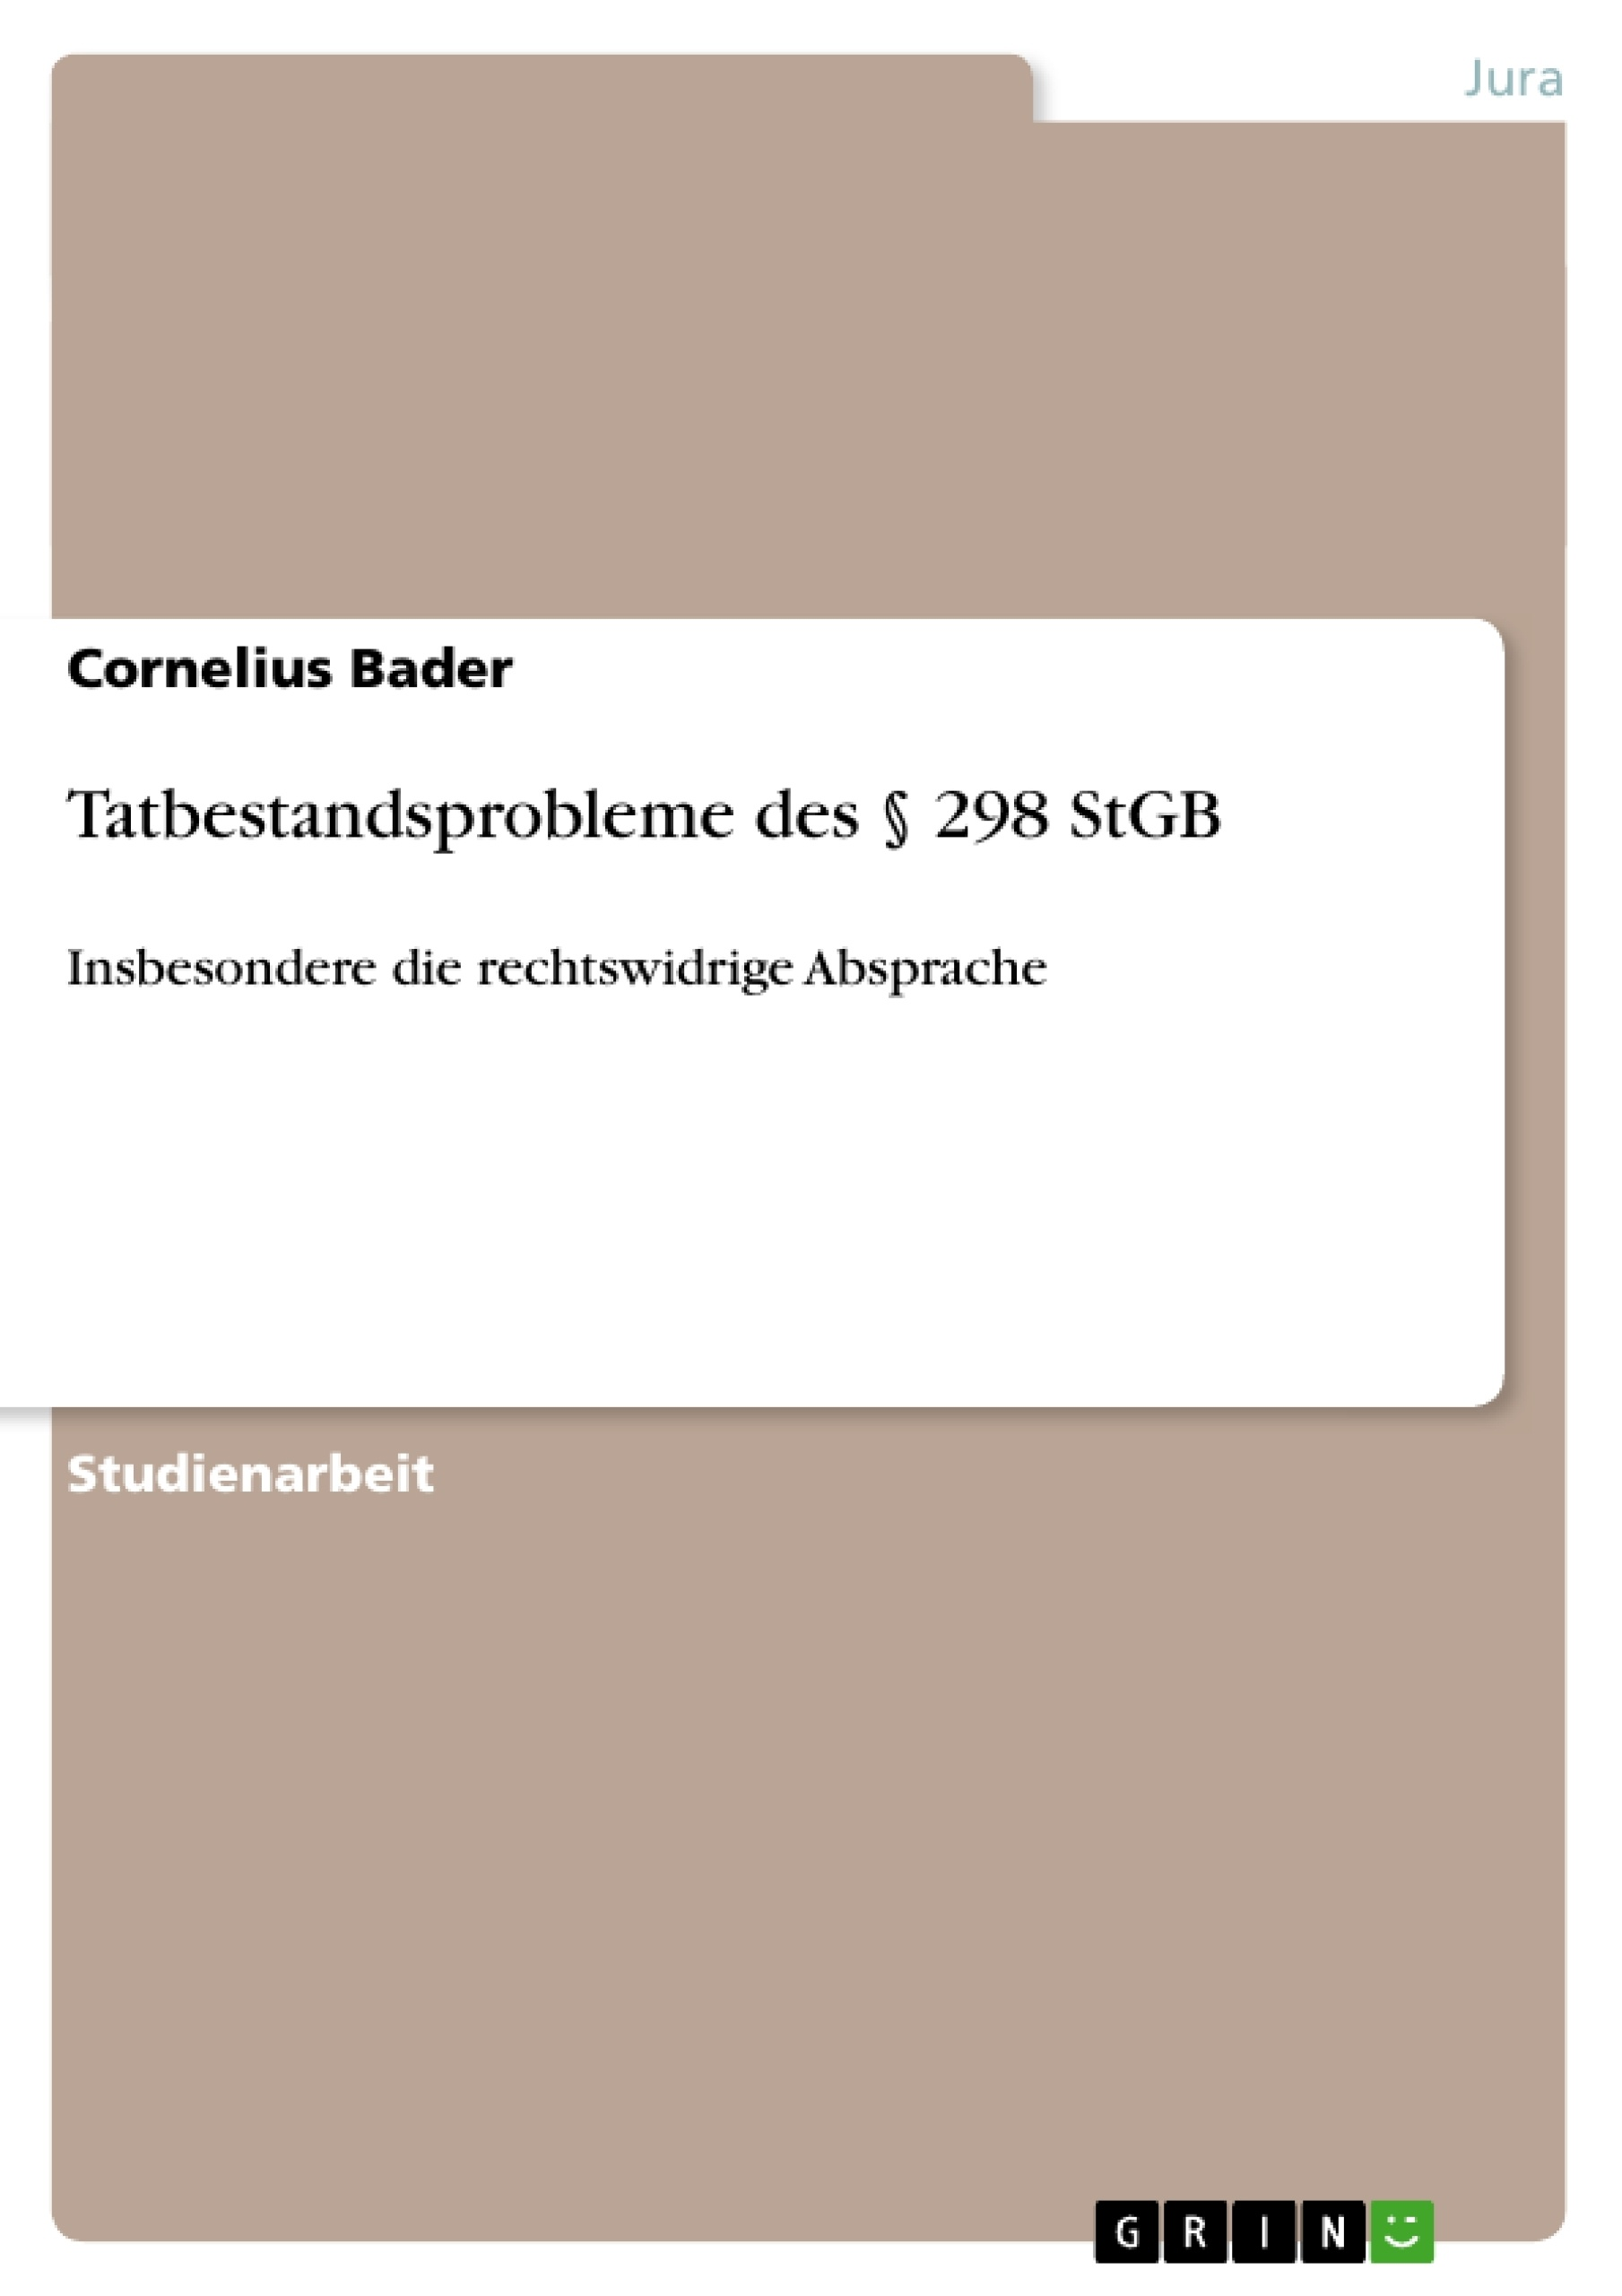 Titel: Tatbestandsprobleme des § 298 StGB